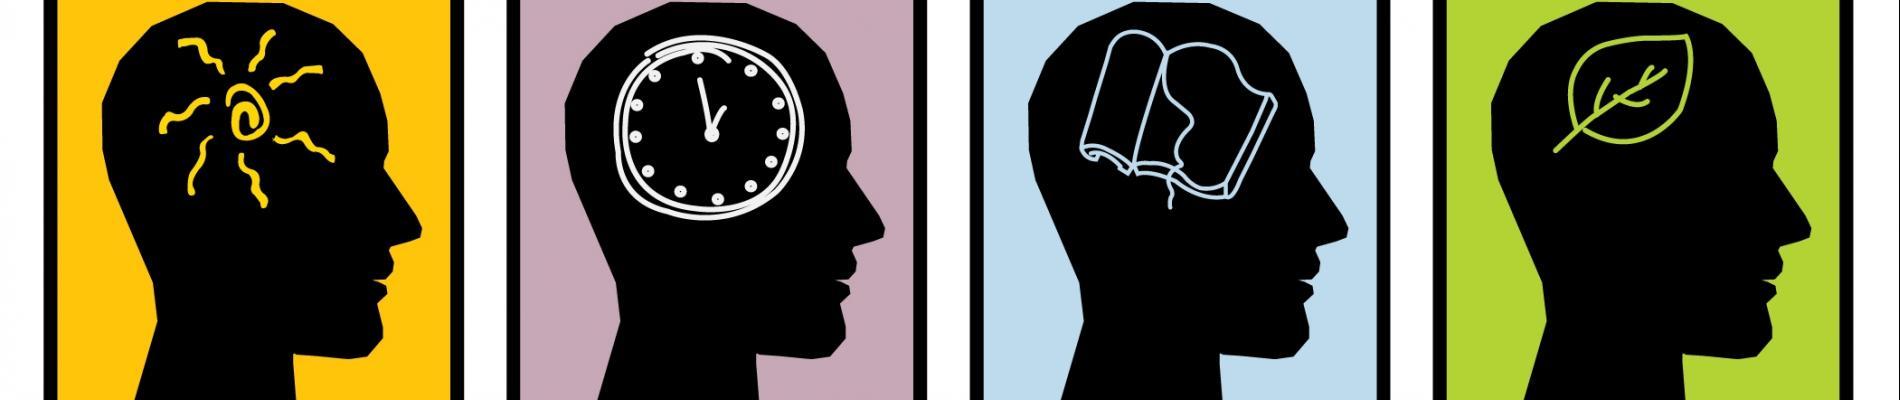 Put Your Best Brain Forward